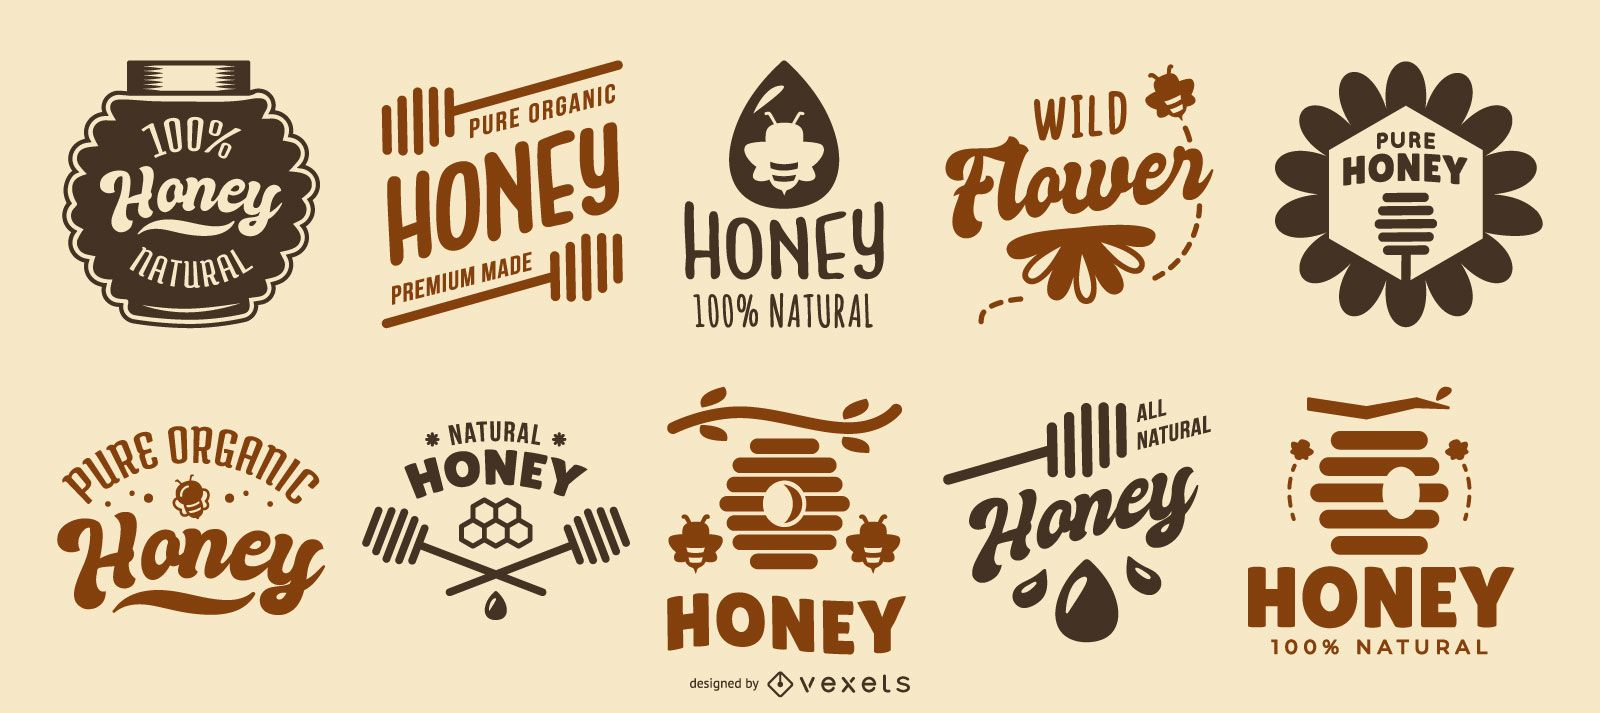 Colección de logos de citas de miel